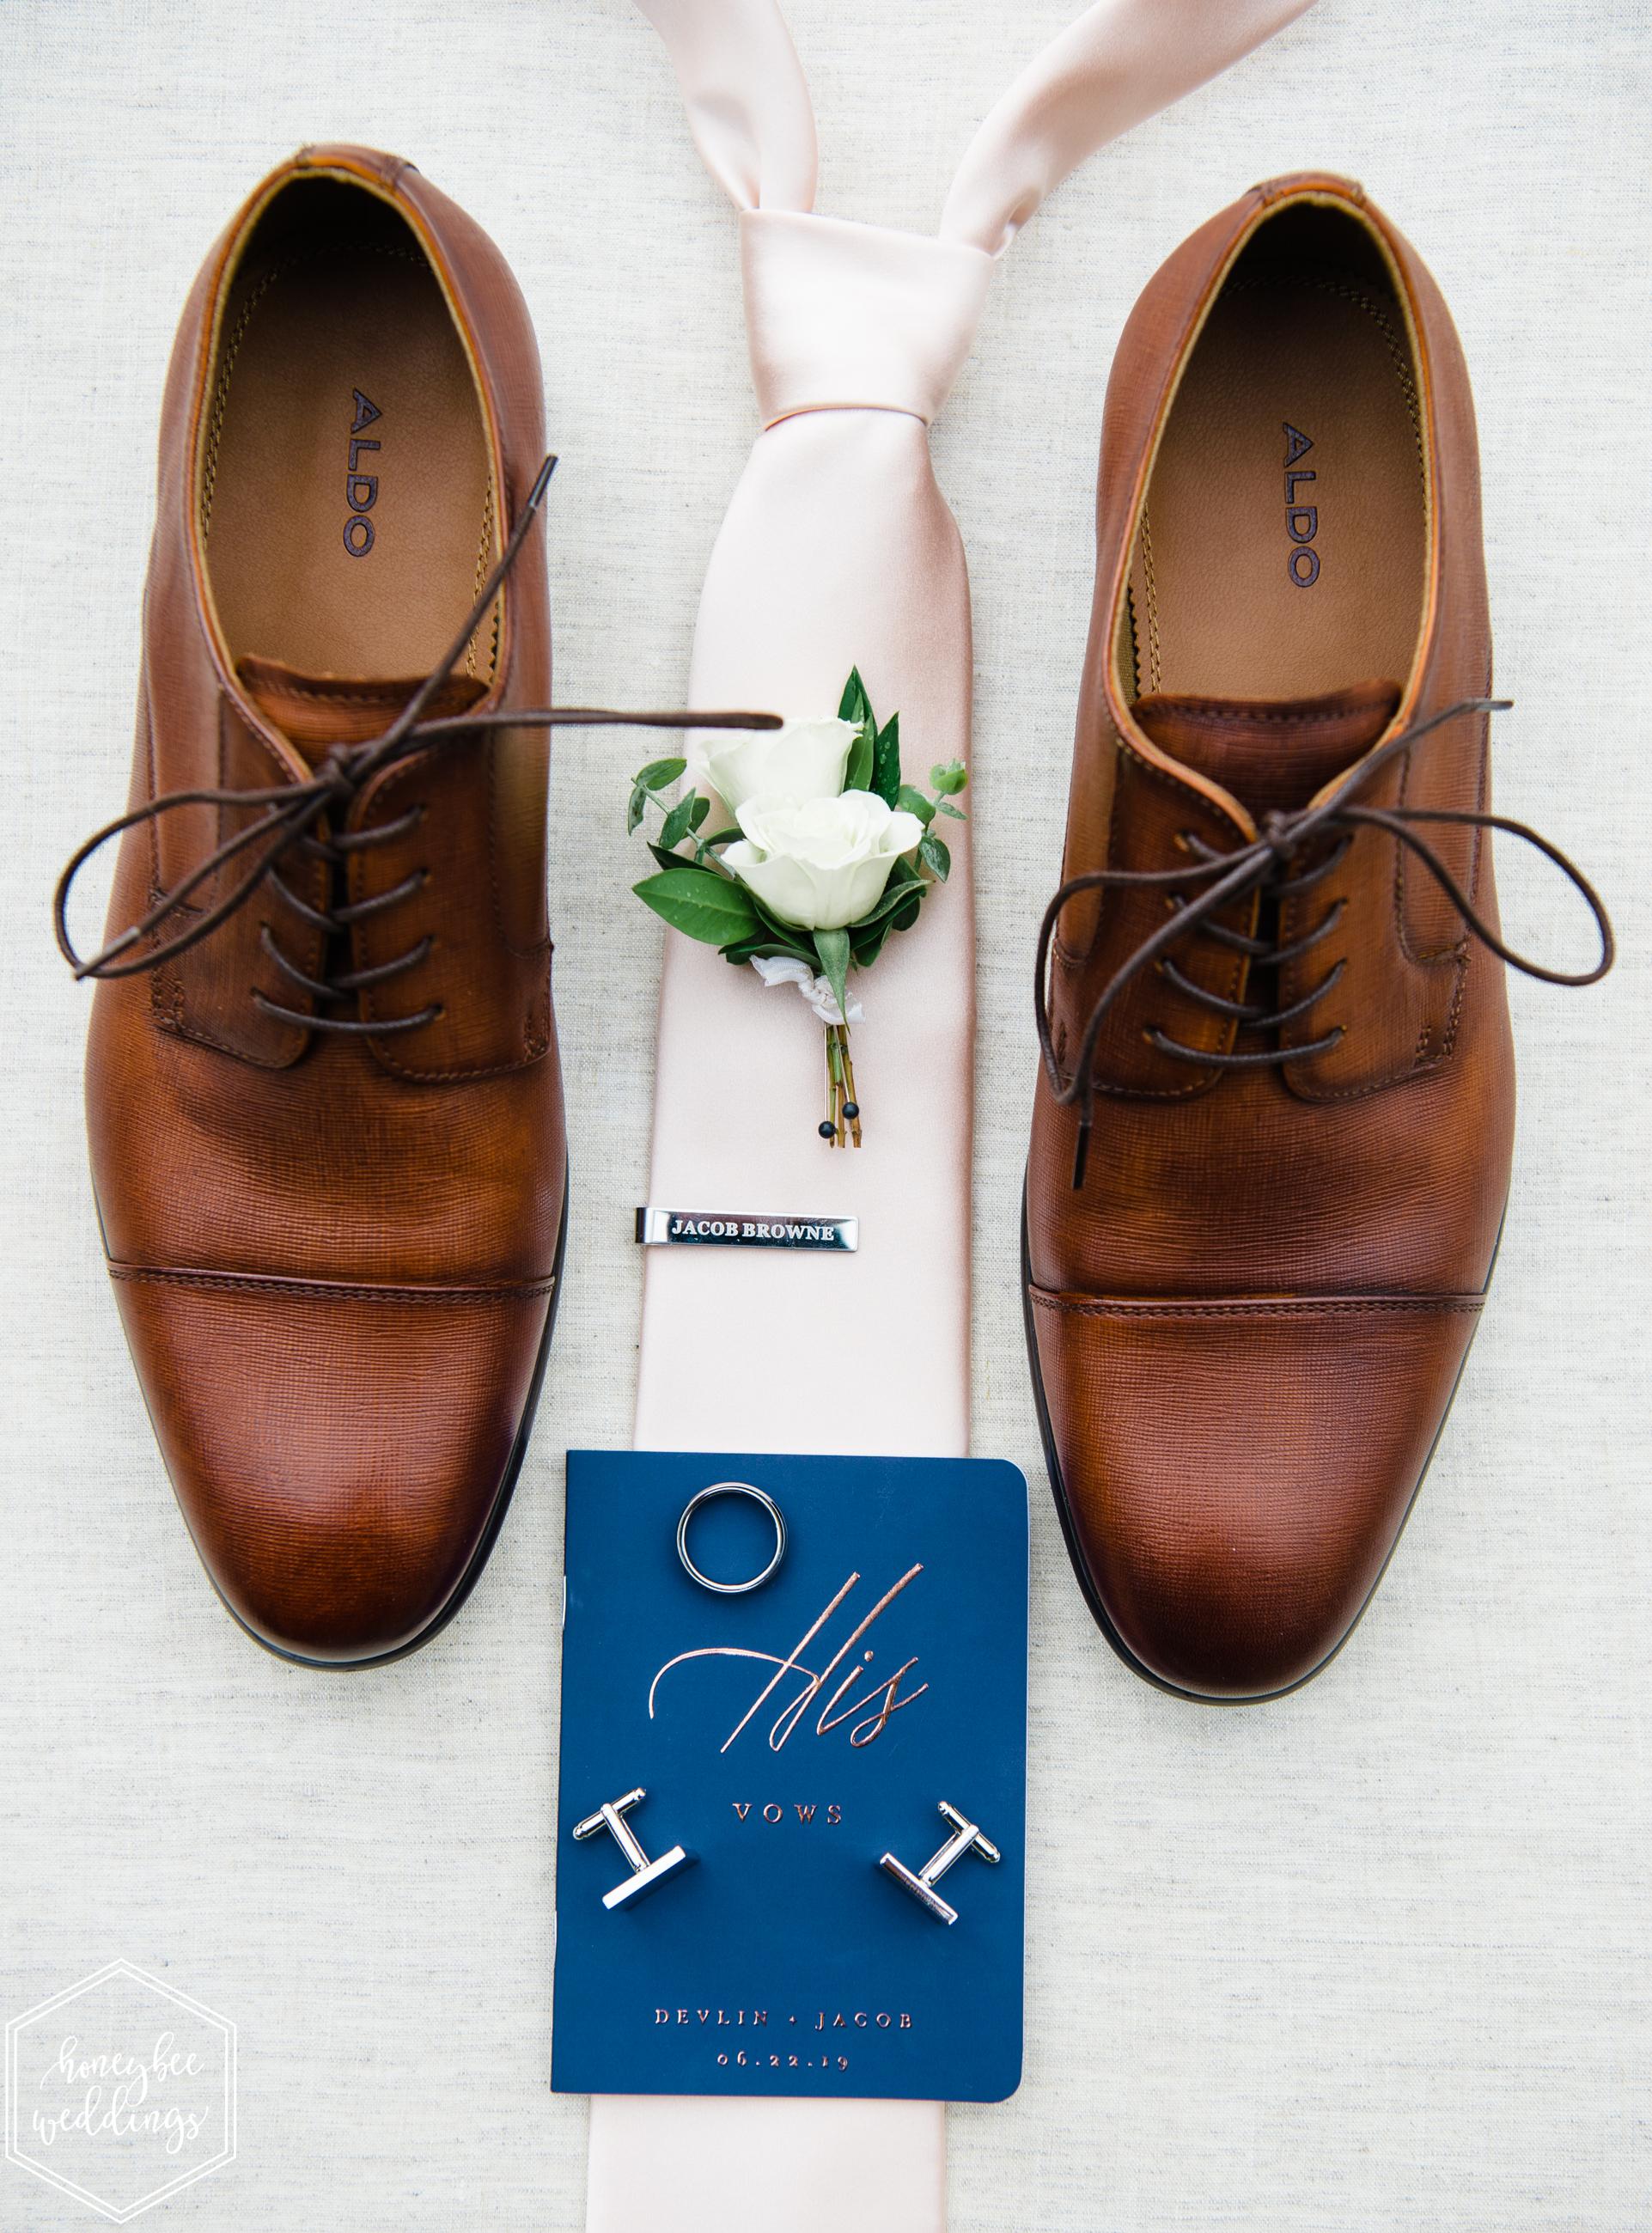 140Montana Wedding Photographer_Missoula Wedding_Honeybee Weddings_Devlin & Jacob_June 22, 2019-64.jpg